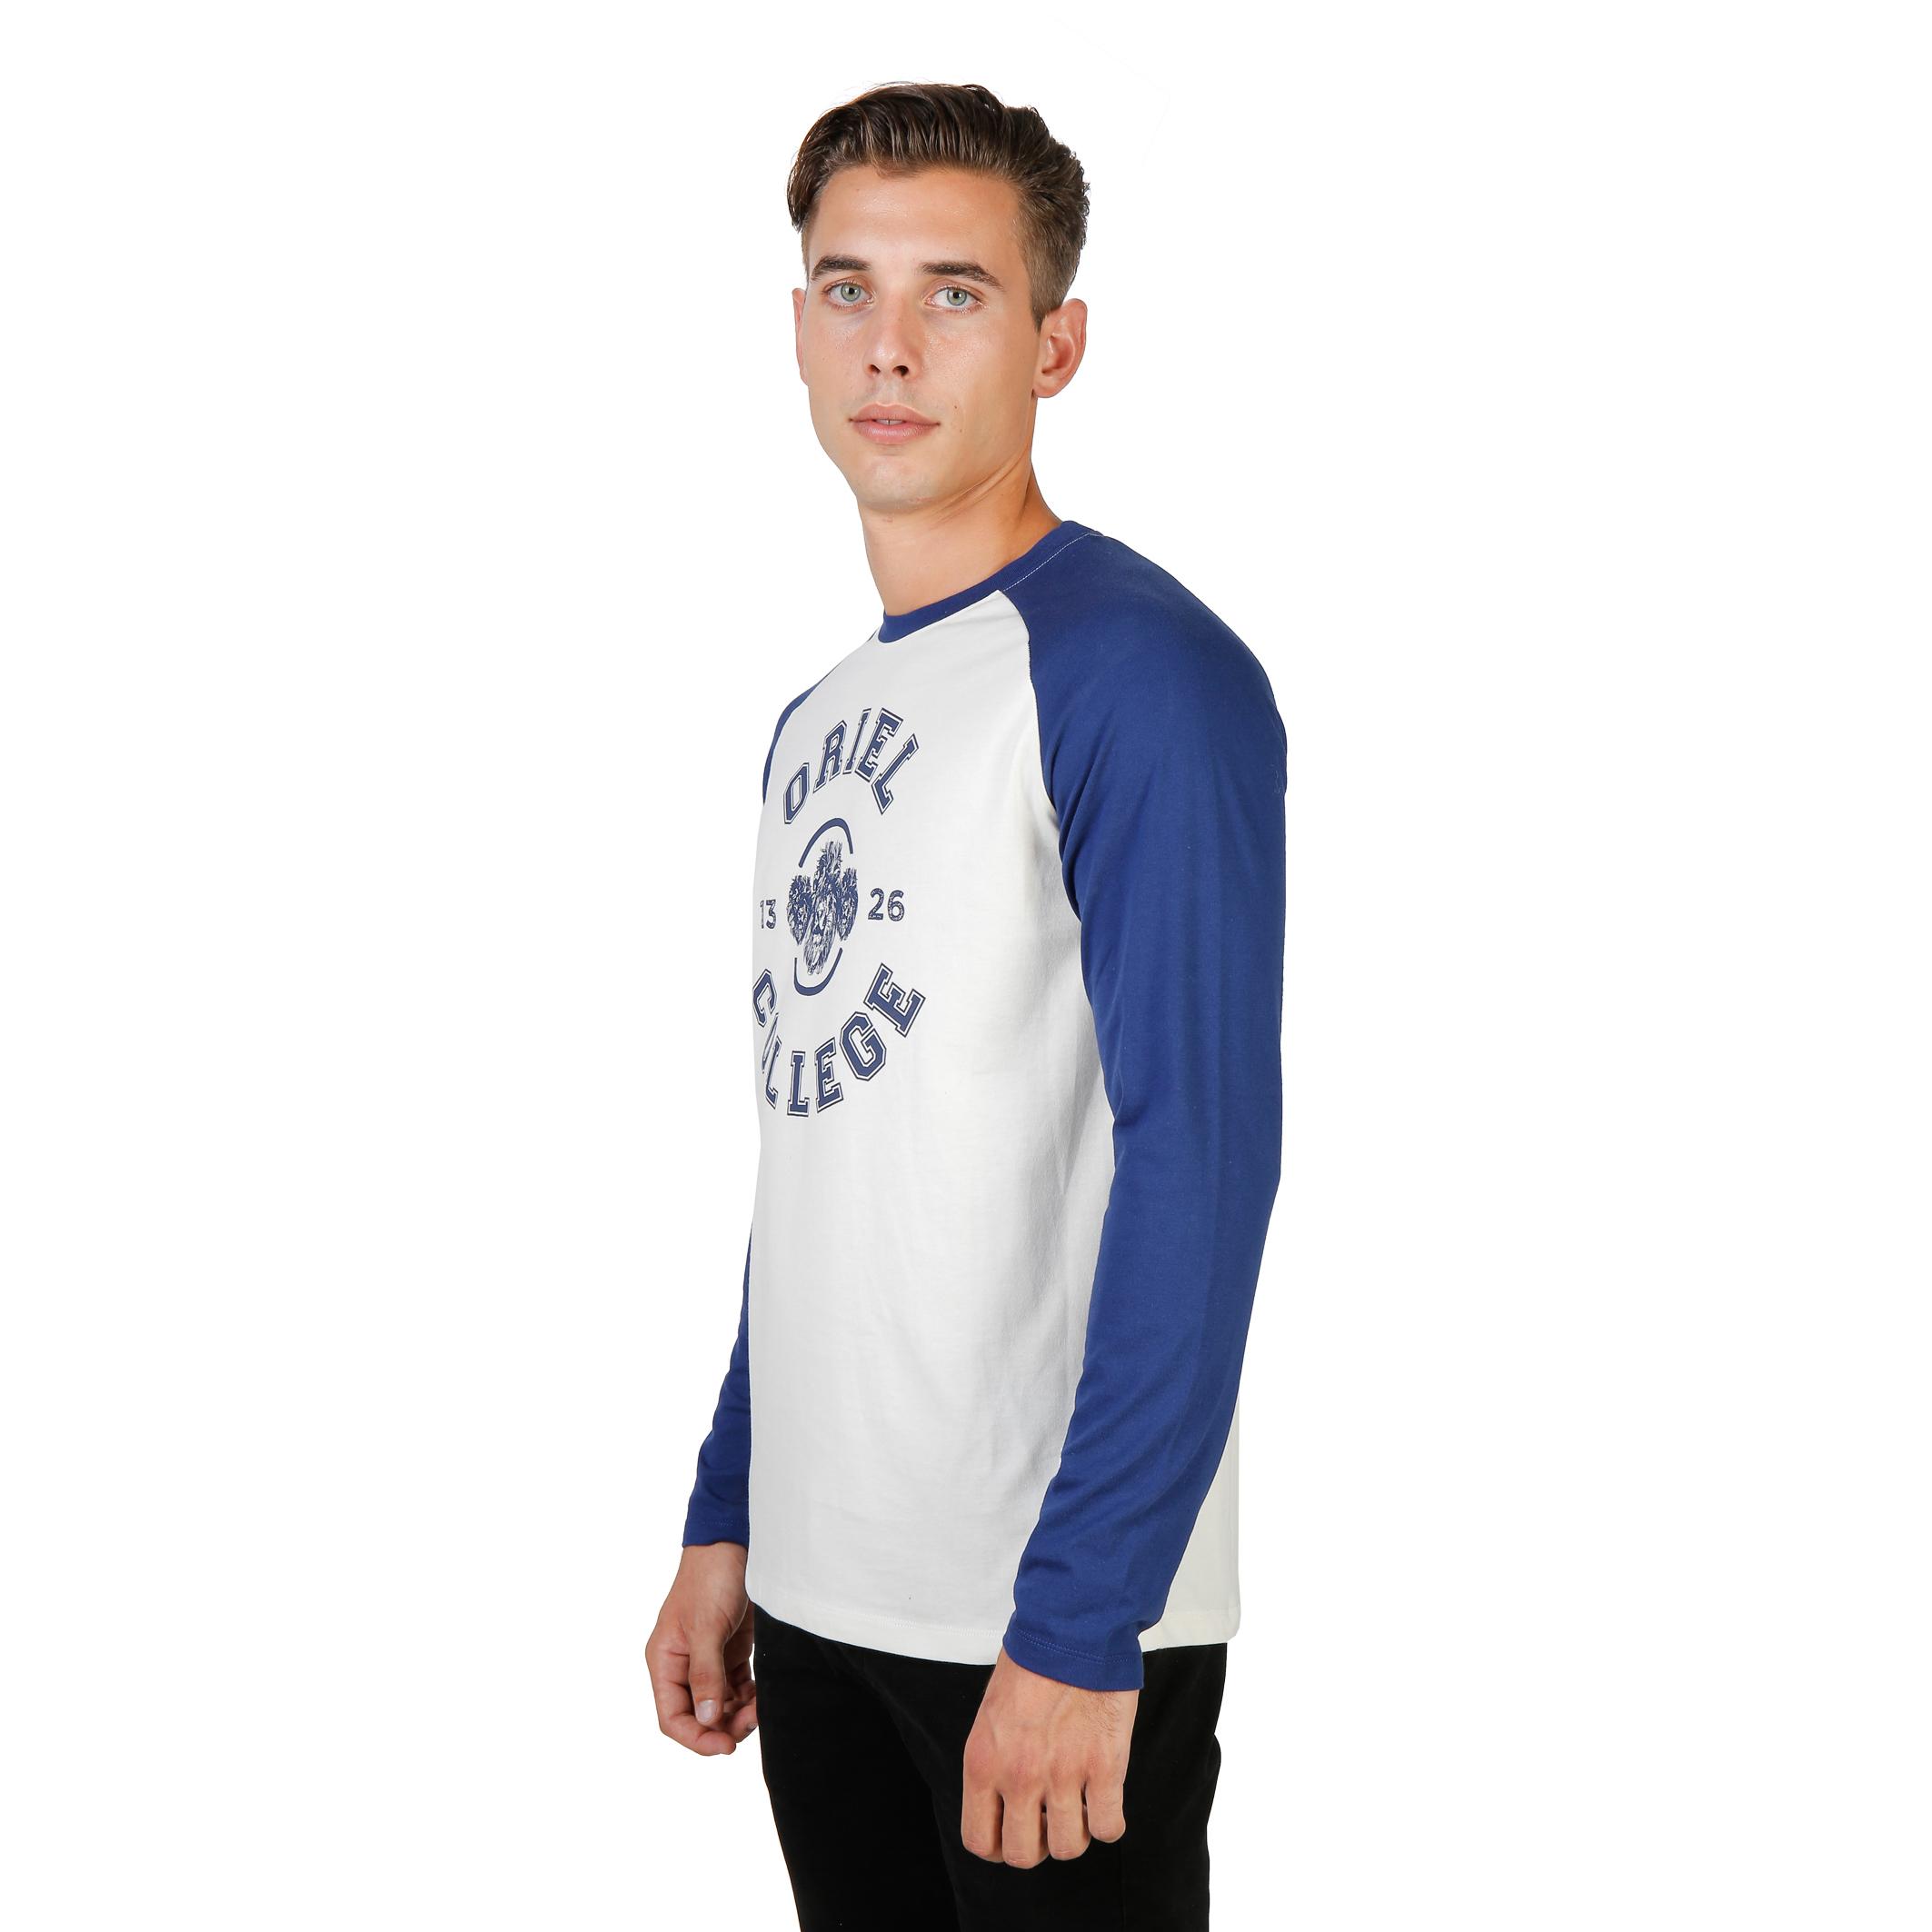 Tee-shirts  Oxford University ORIEL-RAGLAN-ML blue